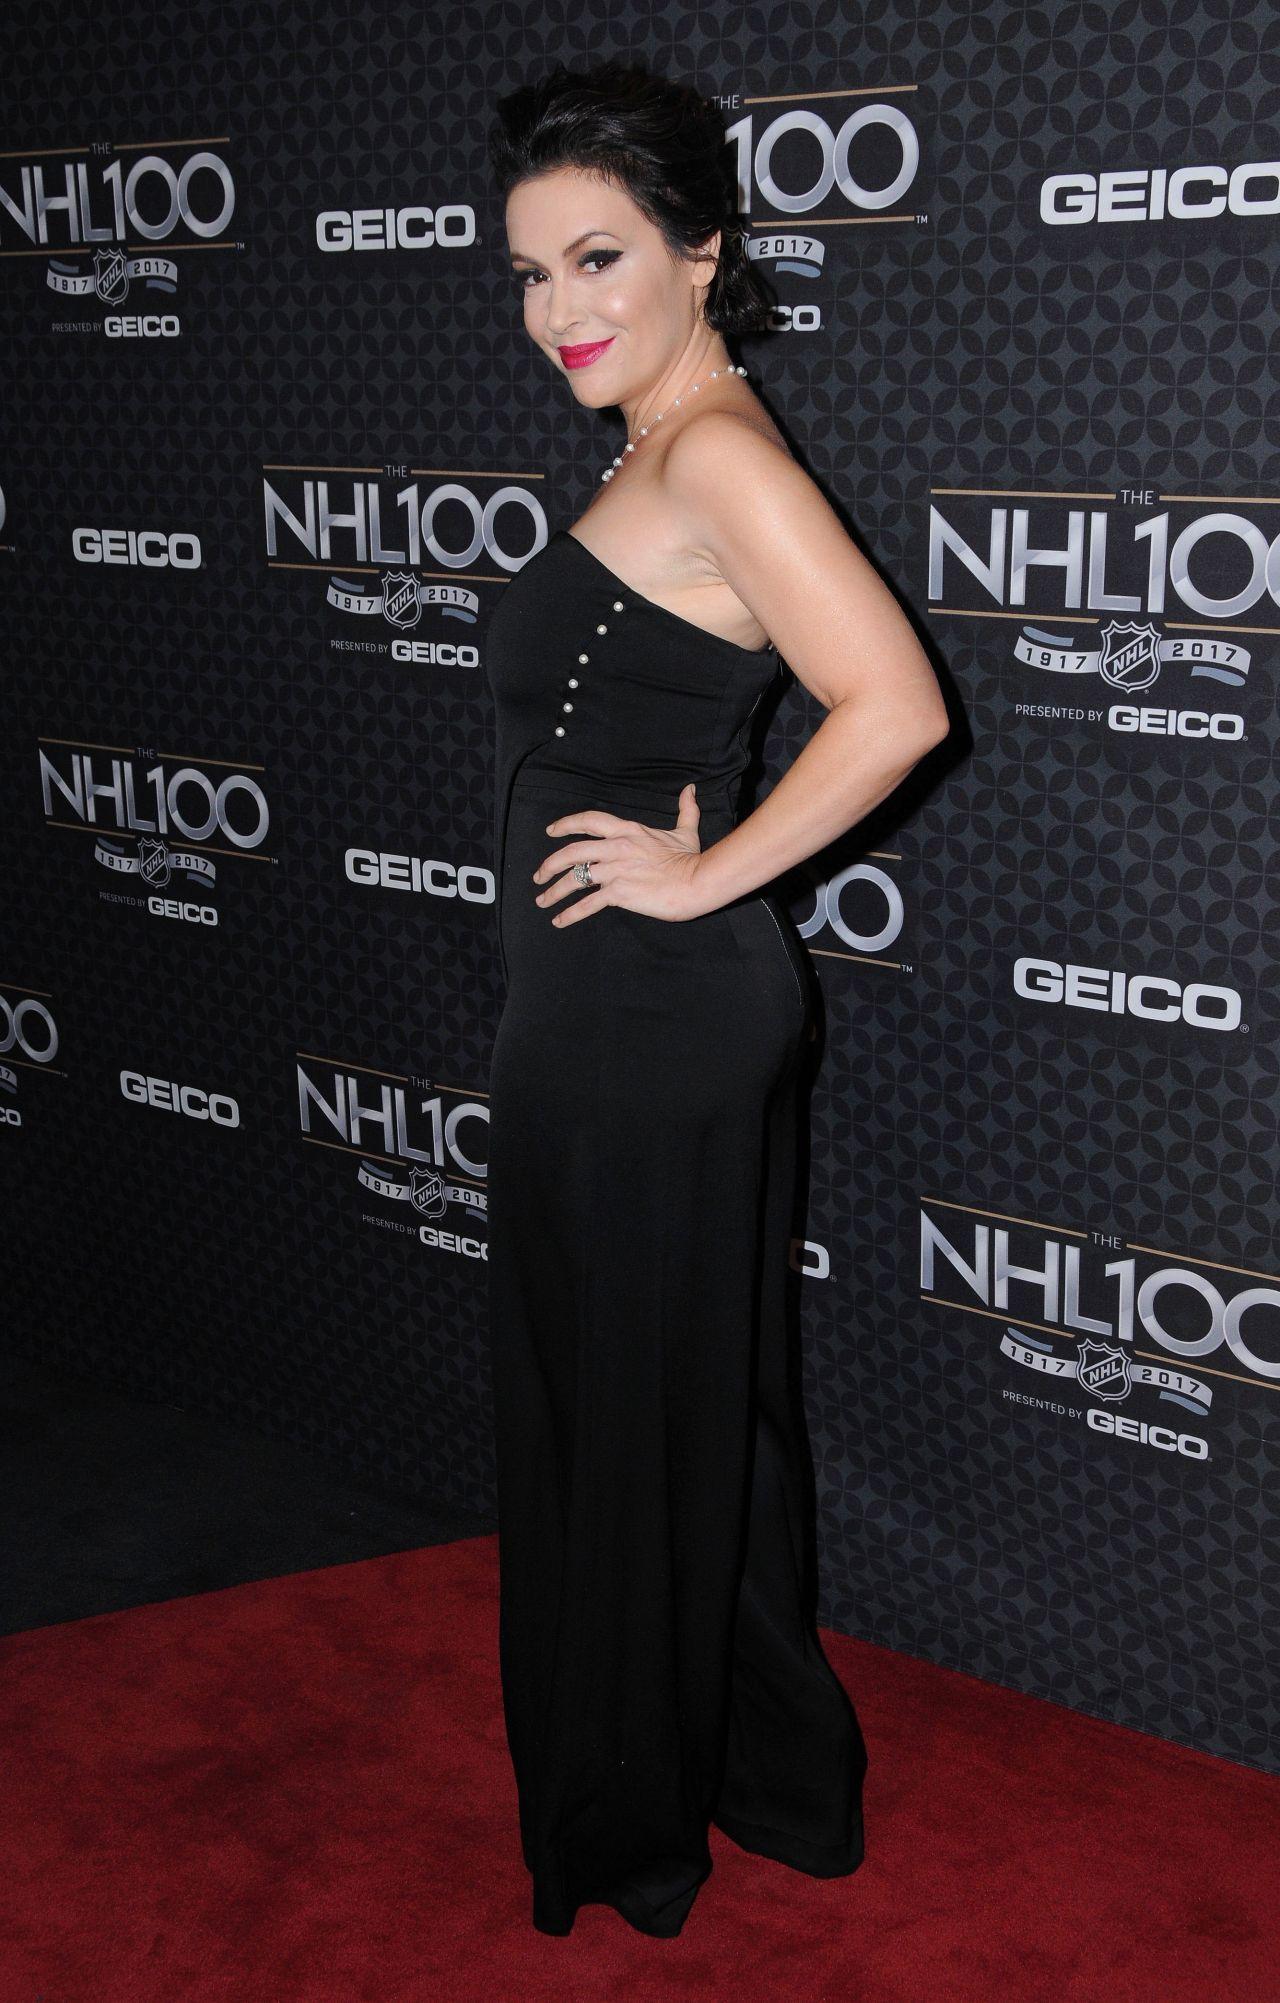 alyssa milano at the nhl 100 2017 nhl all star weekend